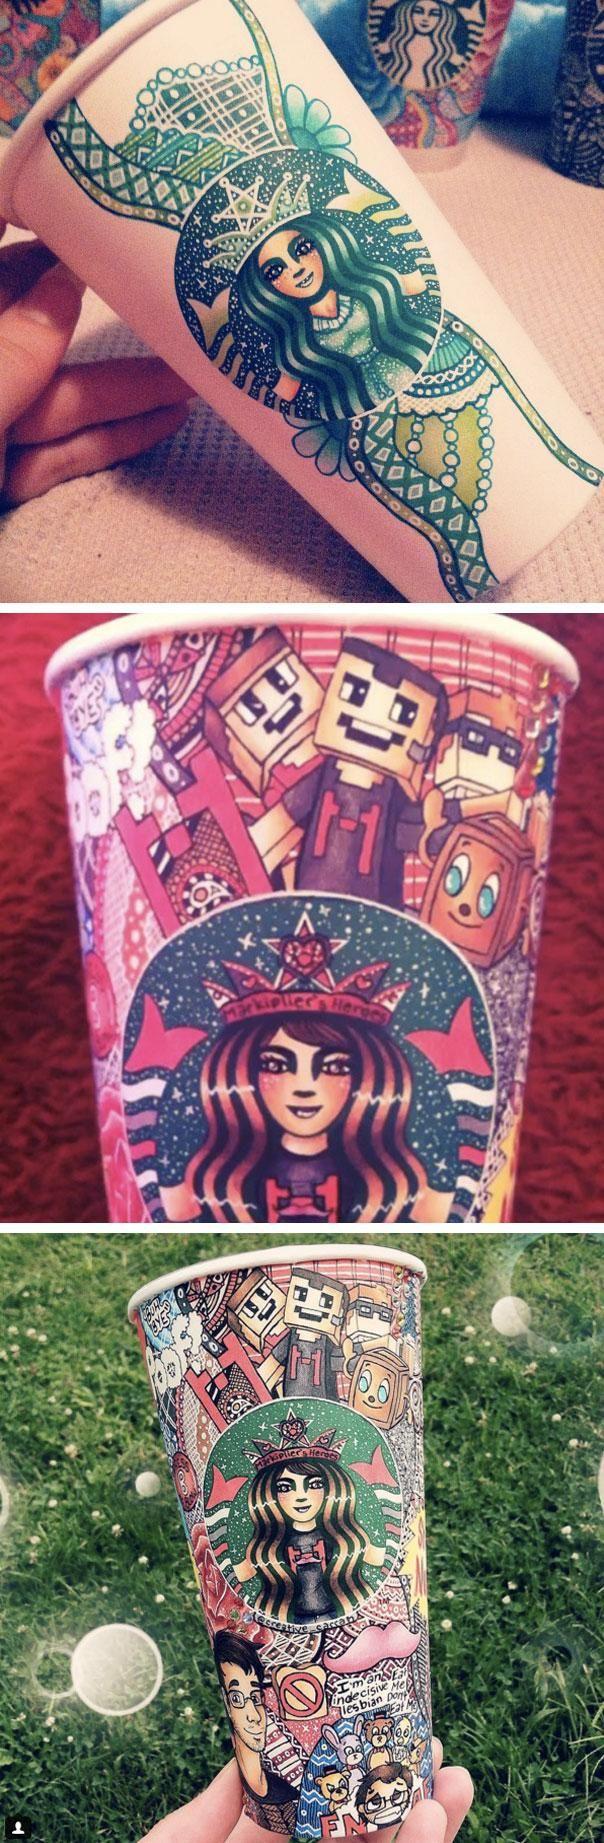 20-year-old artist Carrah Aldridge is turning her Starbucks lattes into masterpieces